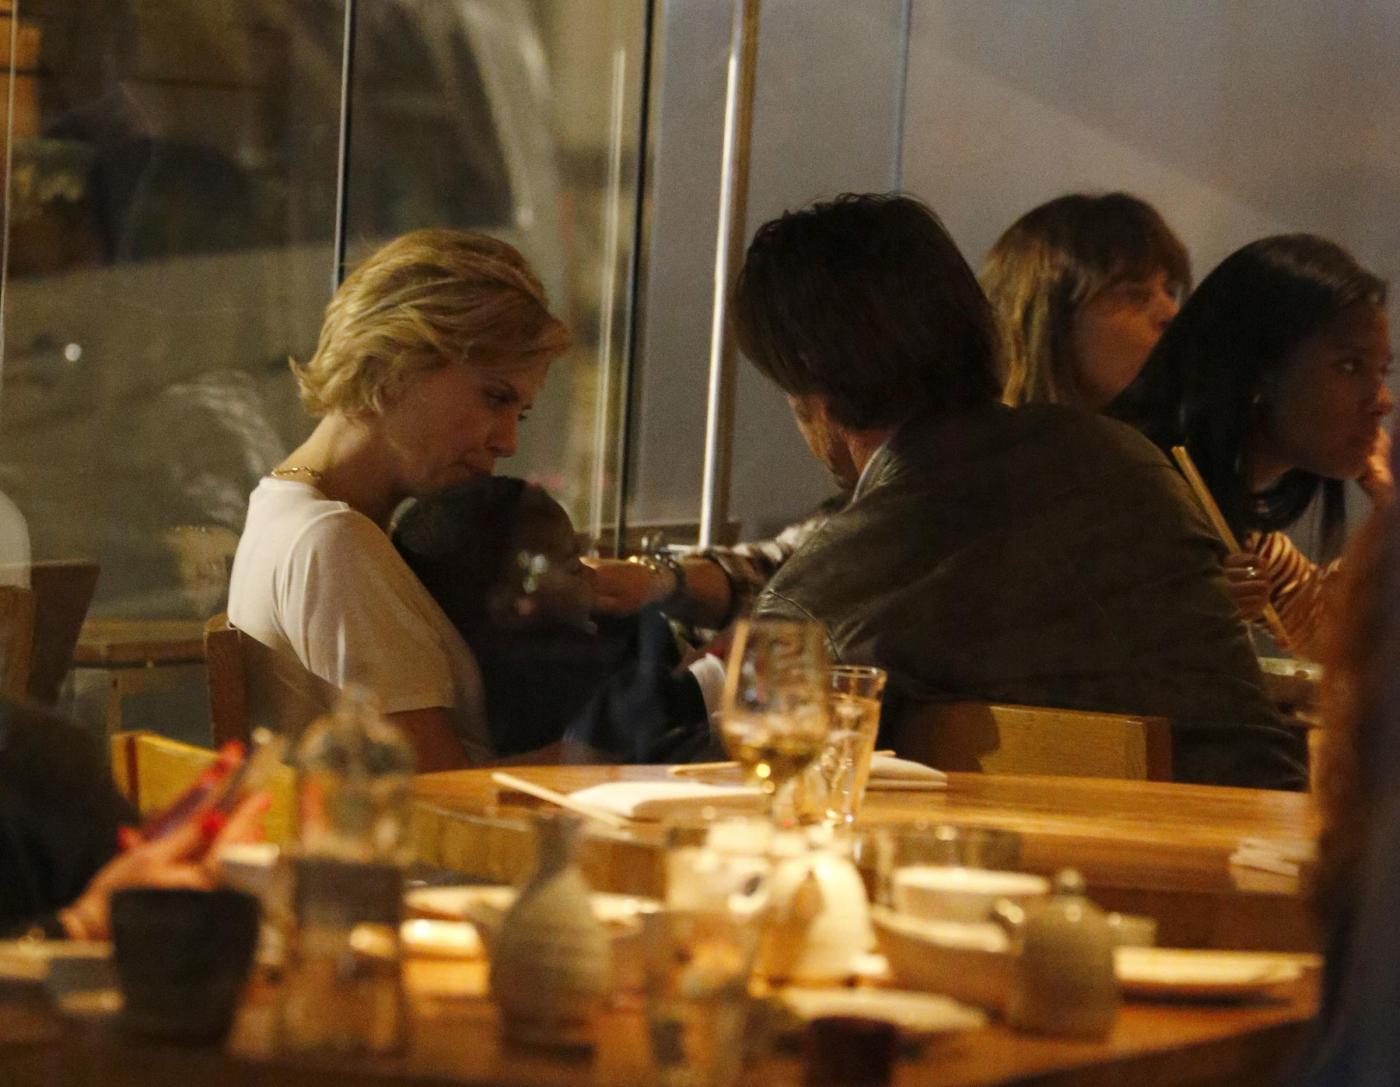 Sean Penn, Charlize Theron, cena in famiglia a Londra01